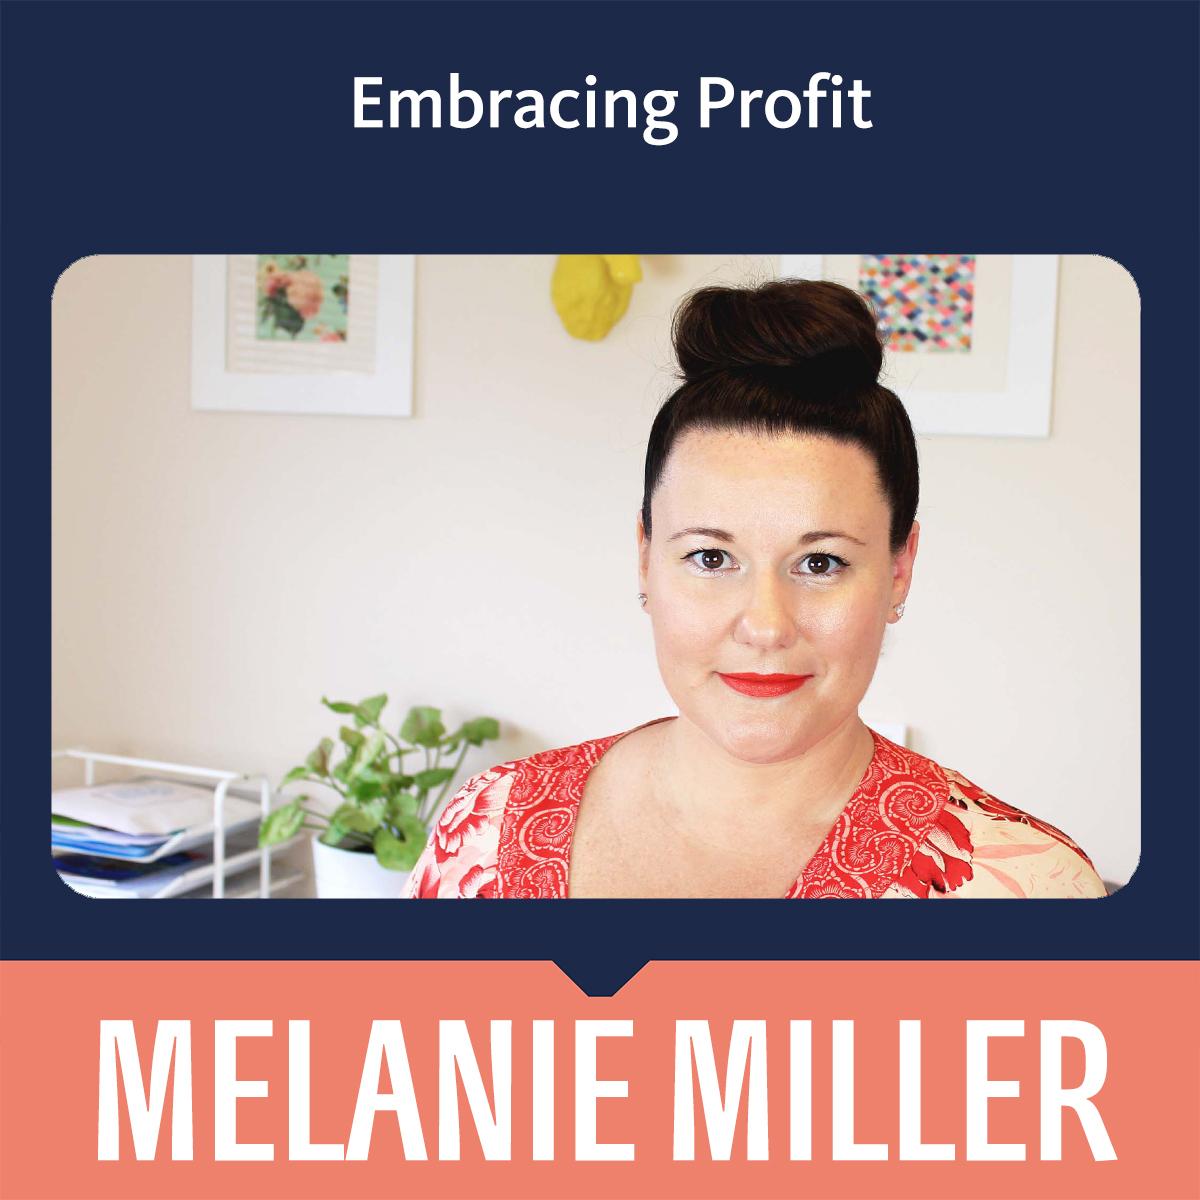 Melanie_Miller_square